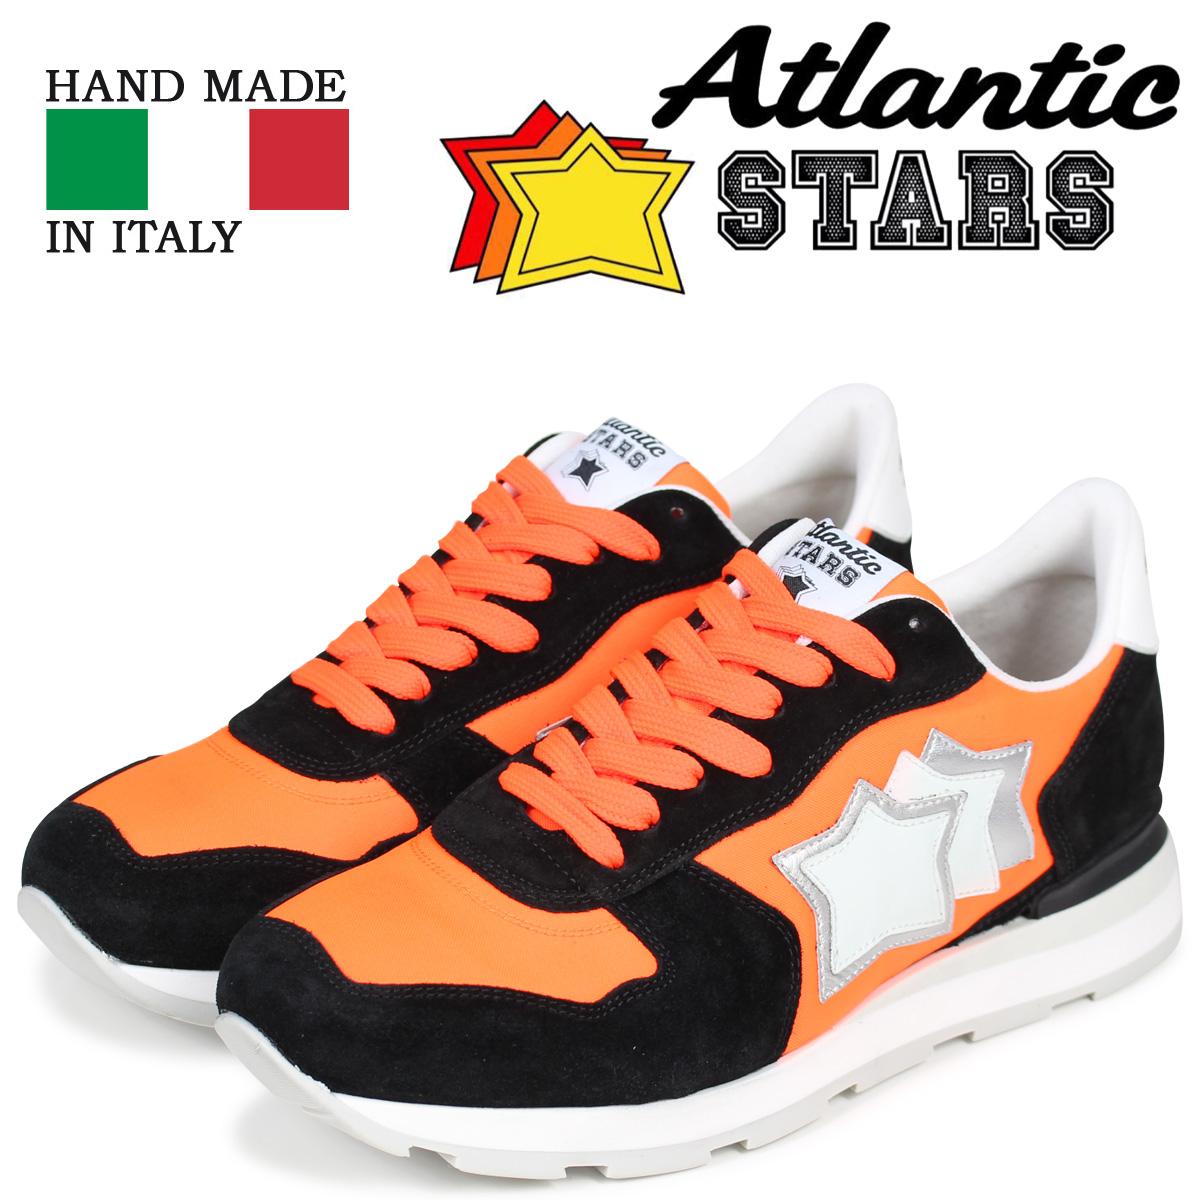 Atlantic STARS メンズ スニーカー アトランティックスターズ アンタレス ANTARES NAF-86N オレンジ